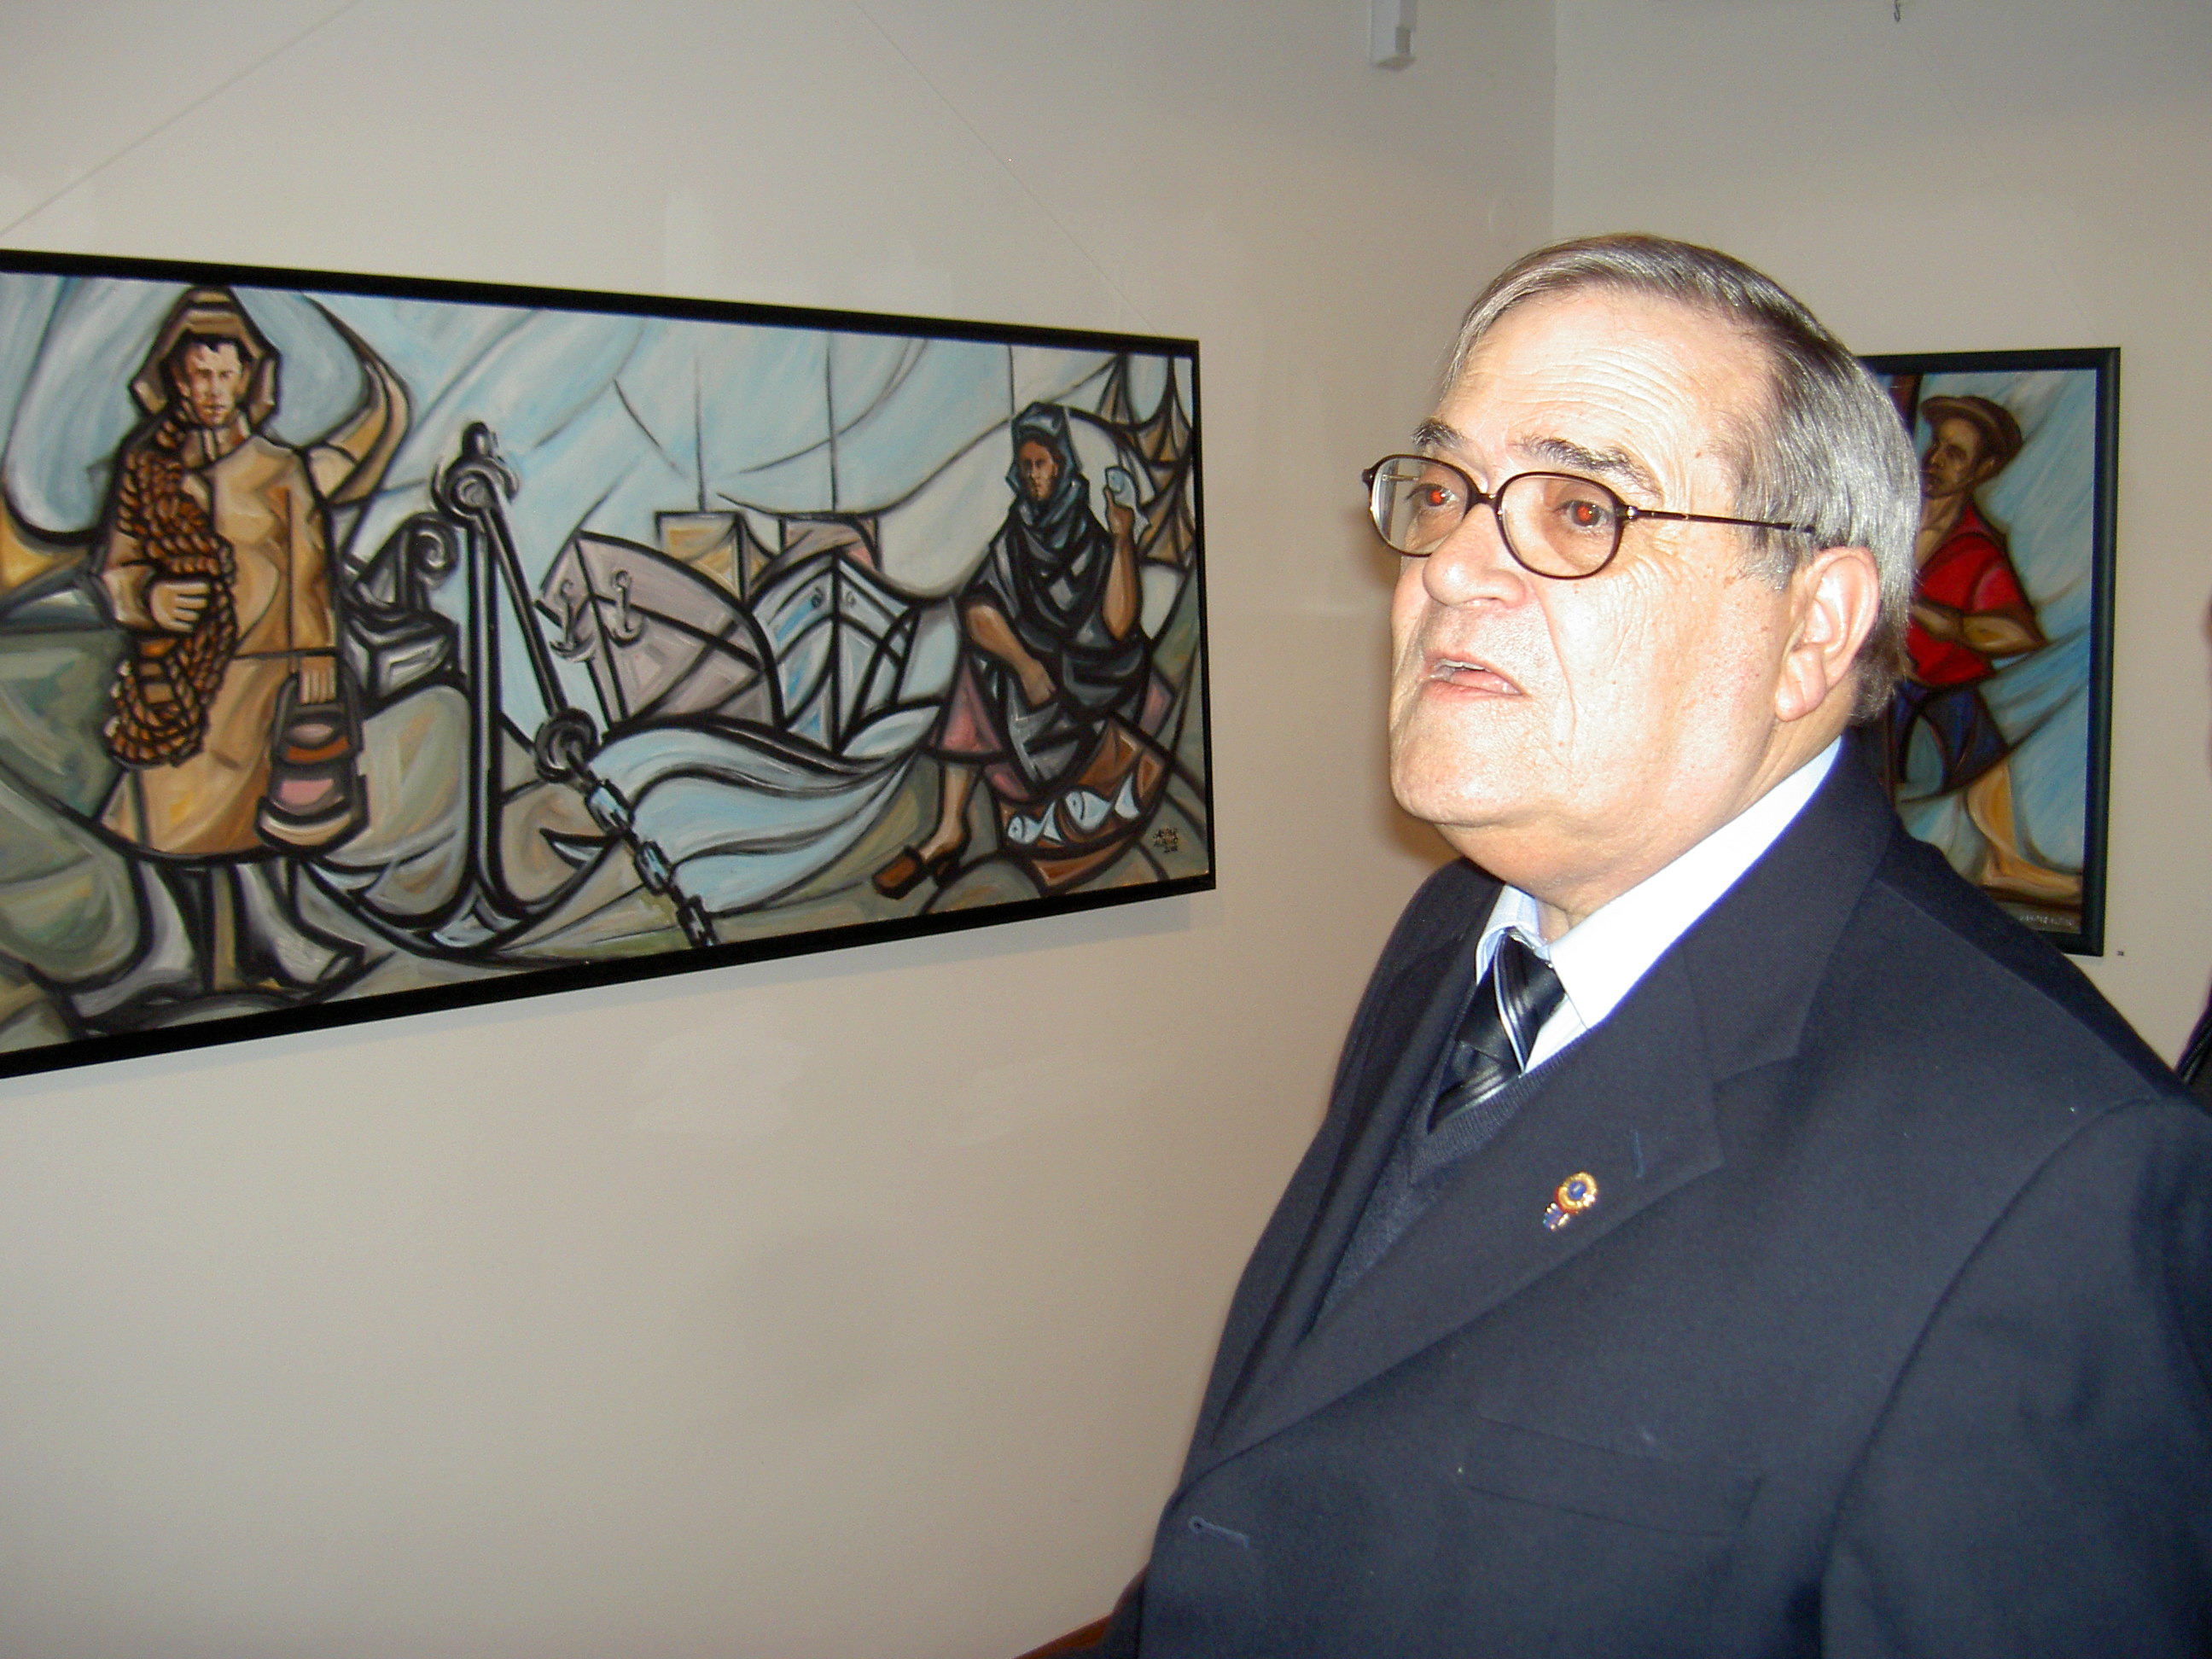 Aveirense ilustre – Gaspar Albino, artista plástico e empresário